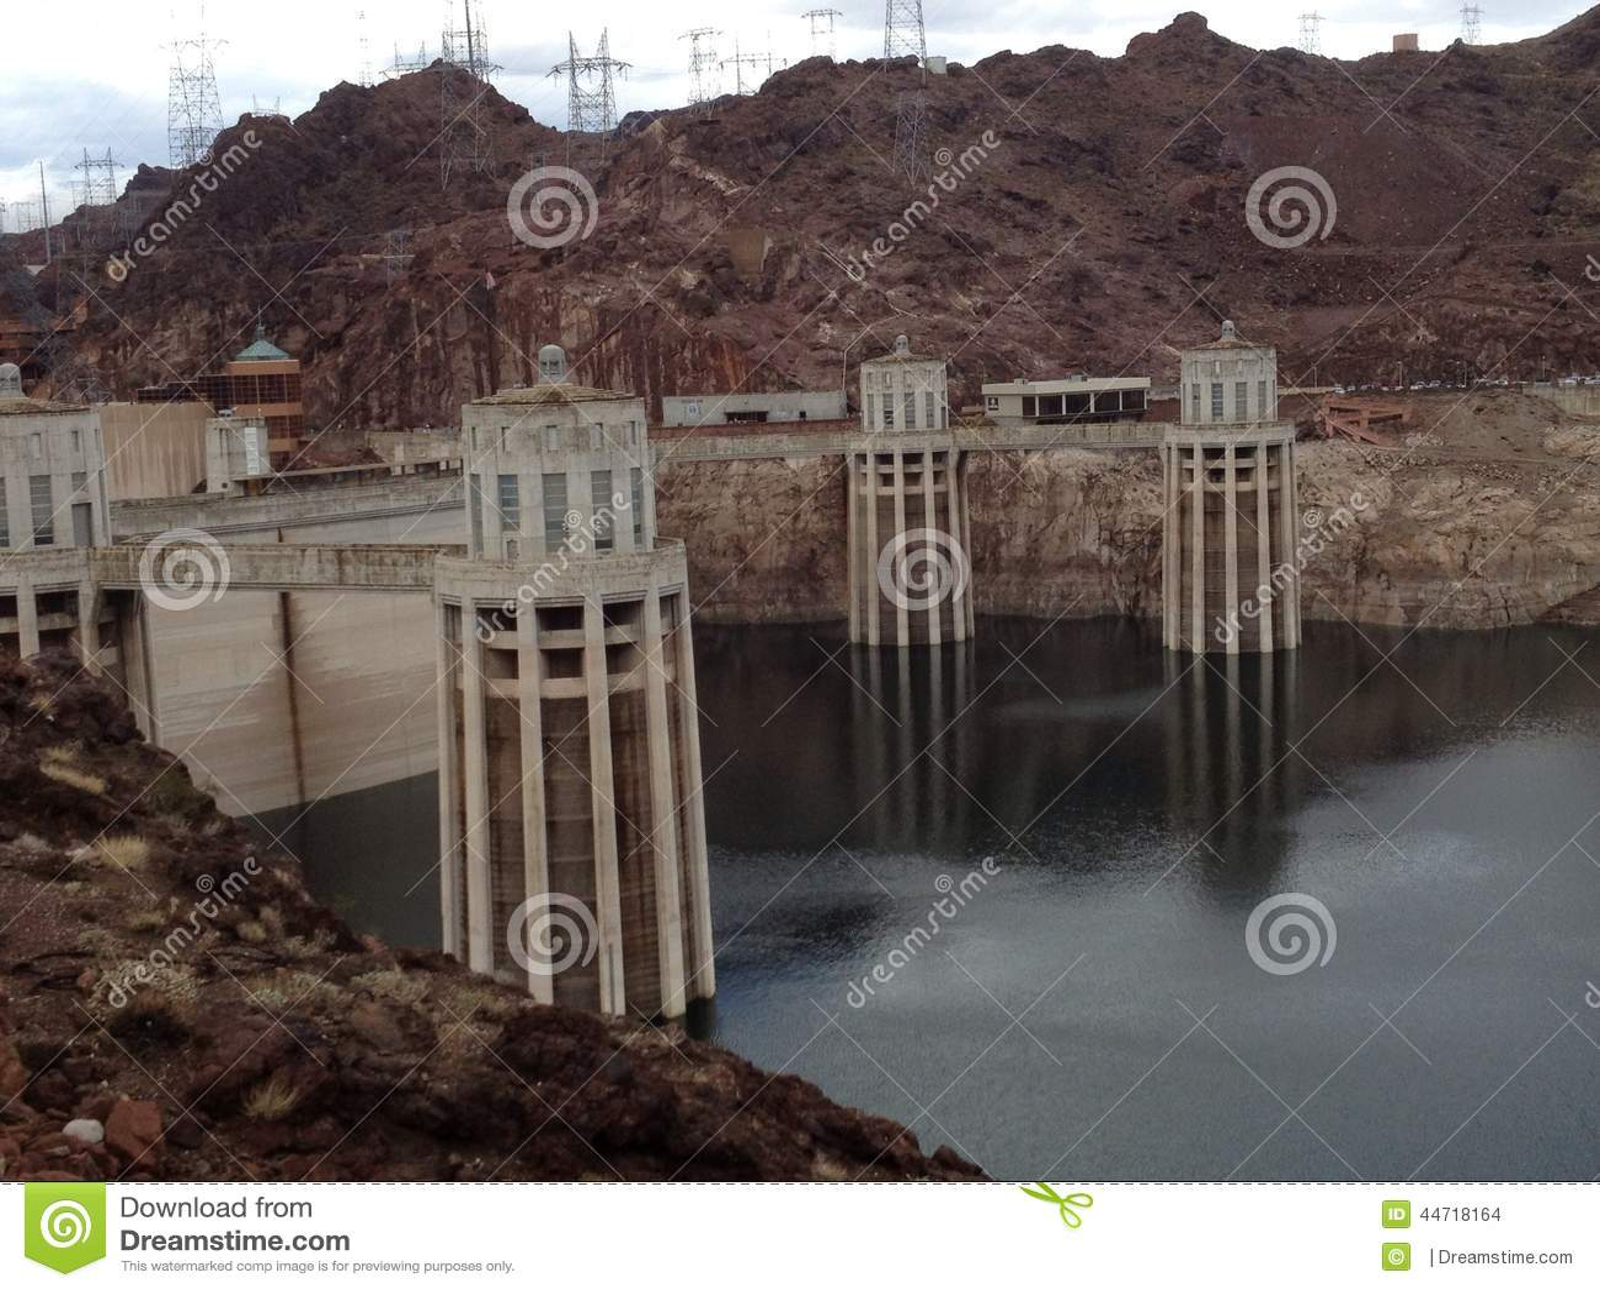 Estimada agua: usted no pasará